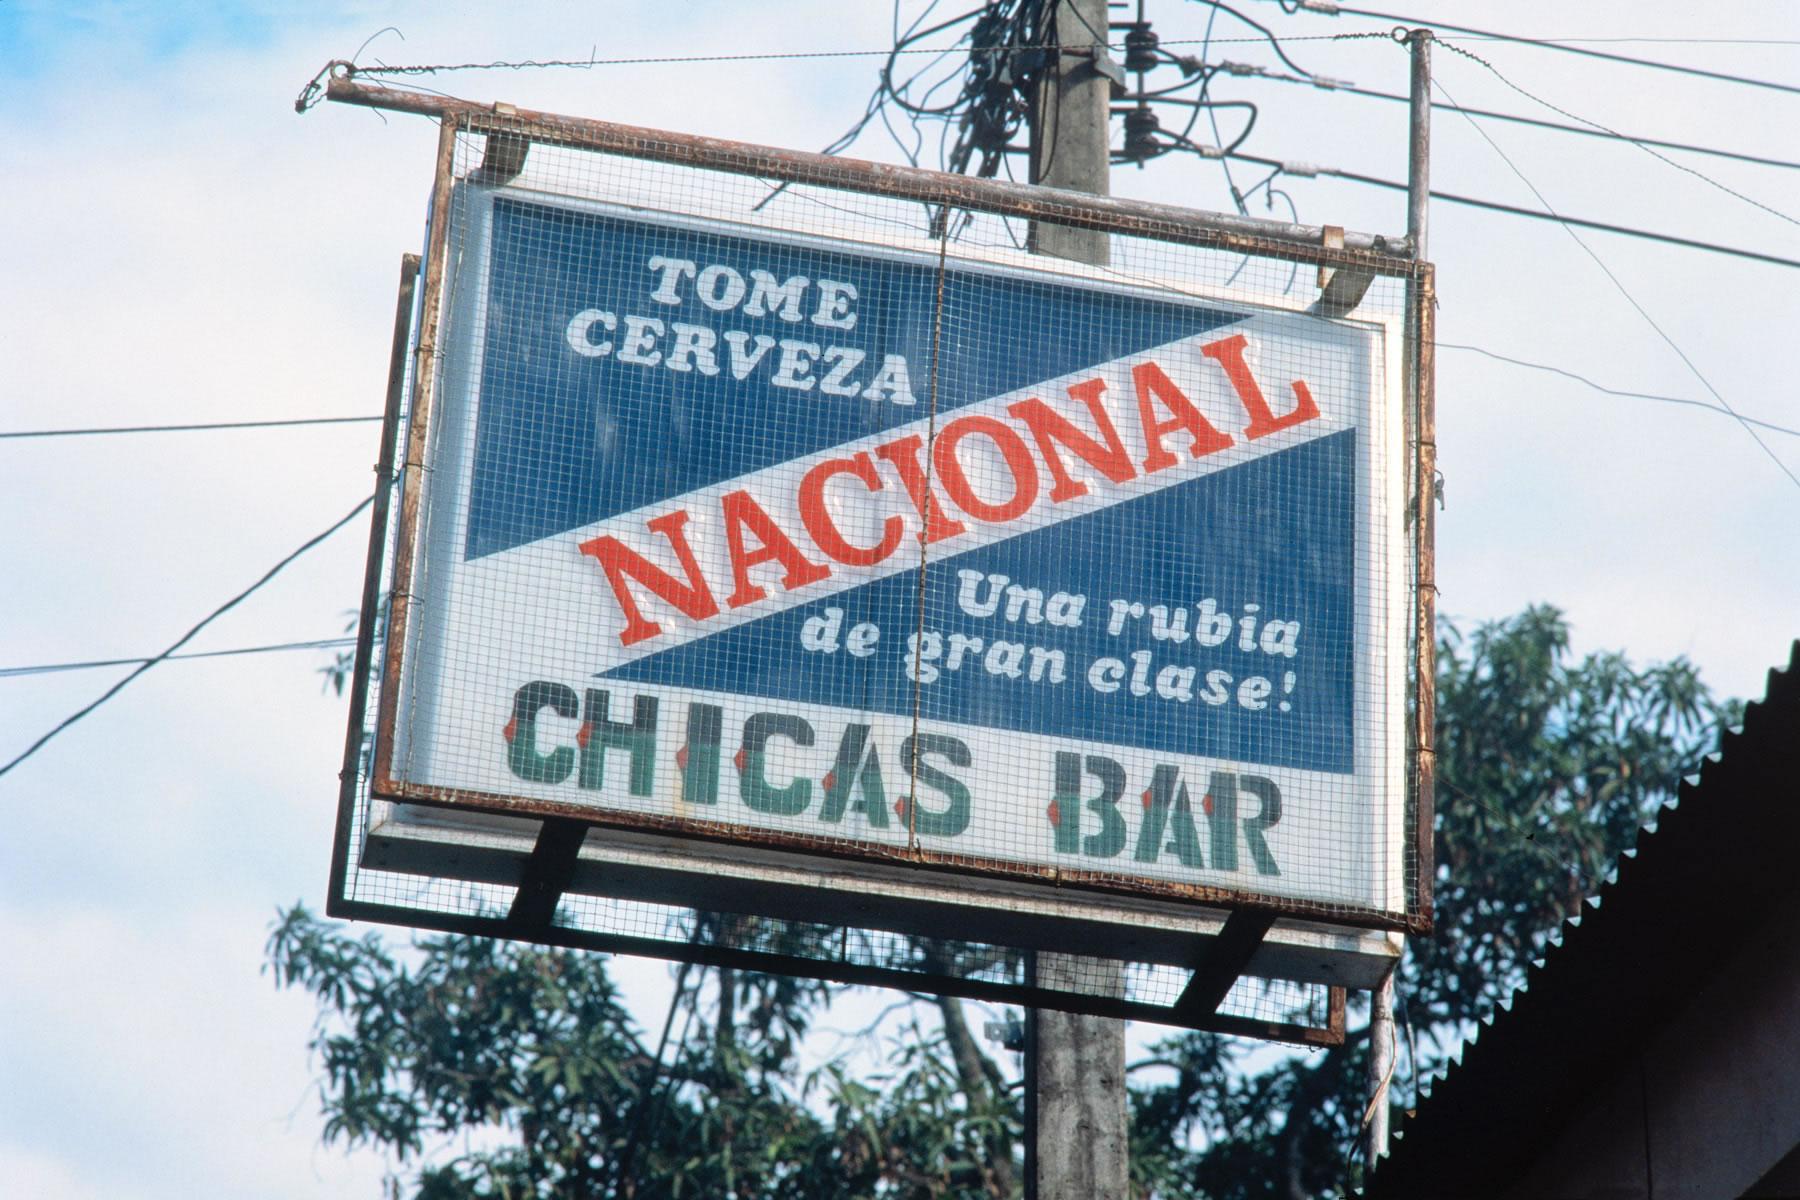 Chicas Bar Honduras CB 02